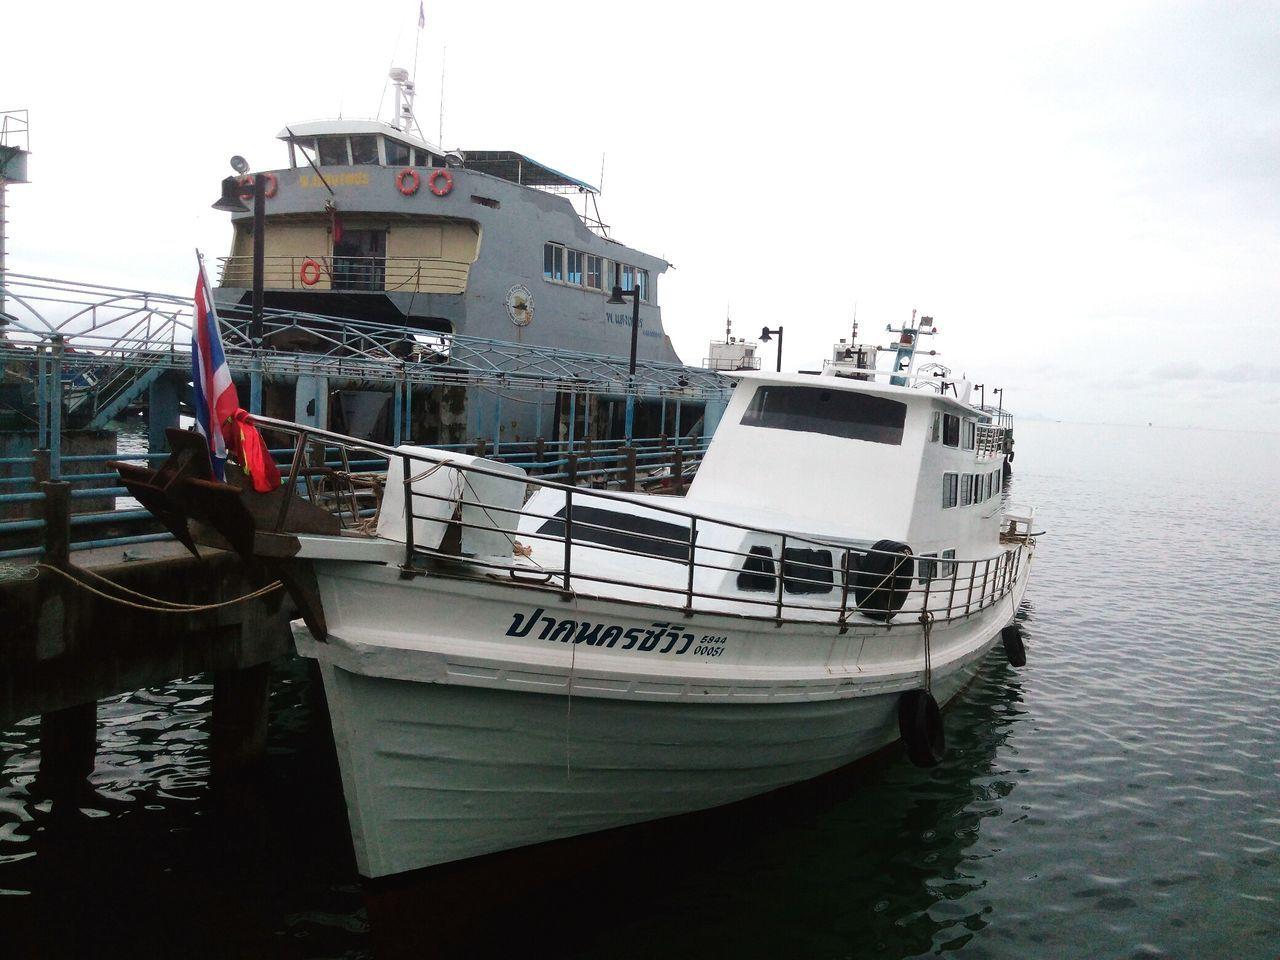 No People Fishermen Boat Serengeti National Park Wild Silent Moment Focus On